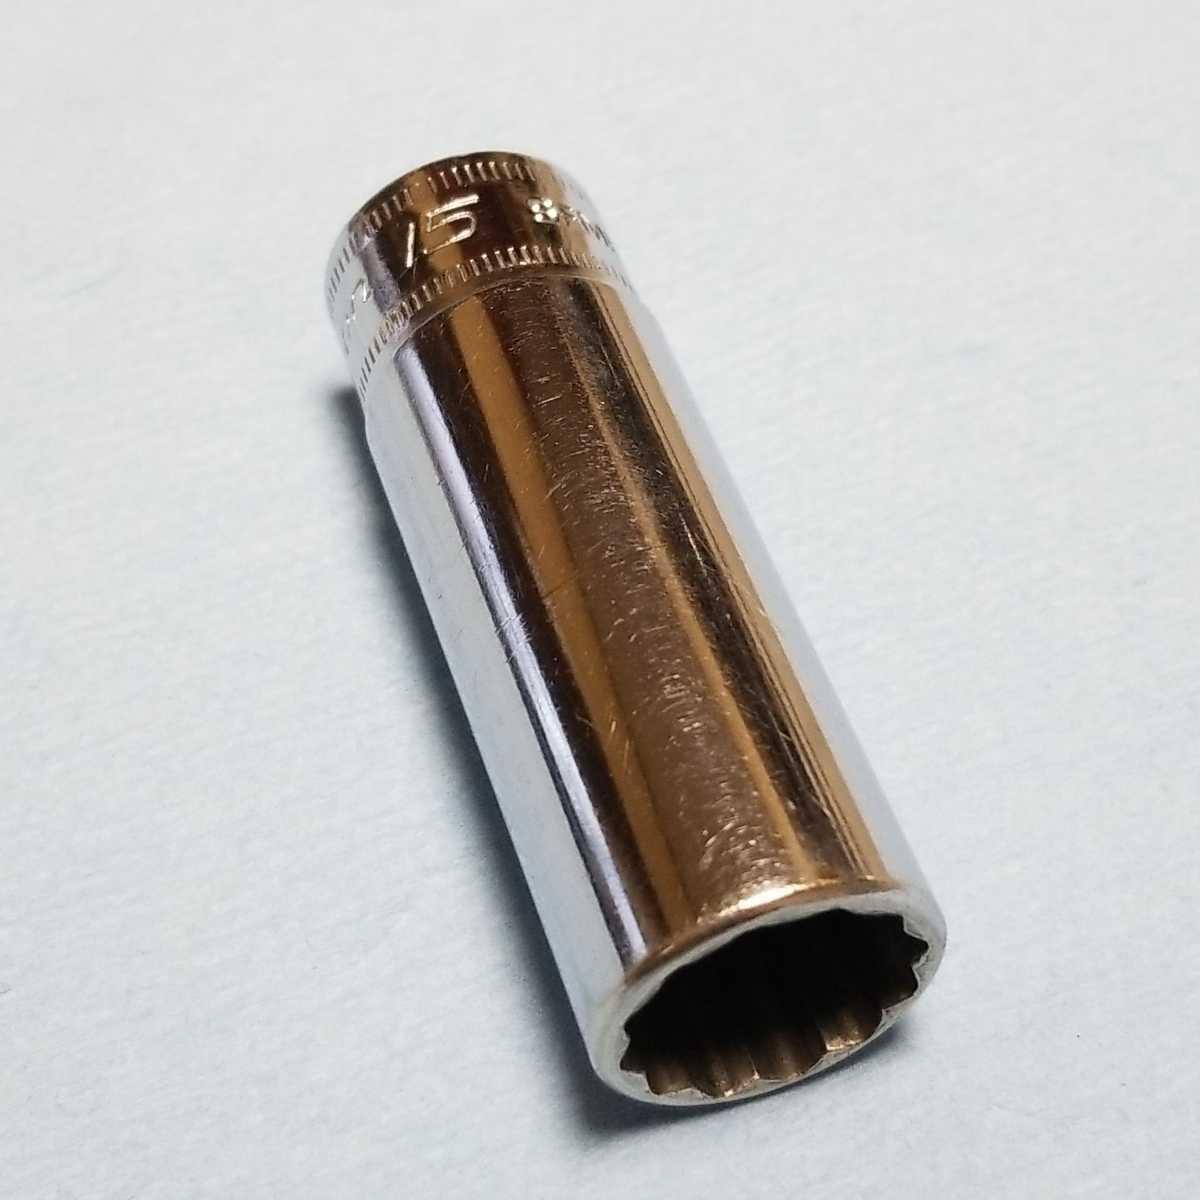 15mm 3/8 ディープ スナップオン SFM15 (12角) 中古品 保管品 SNAPON SNAP-ON ディープソケット ソケット 送料無料 _画像1